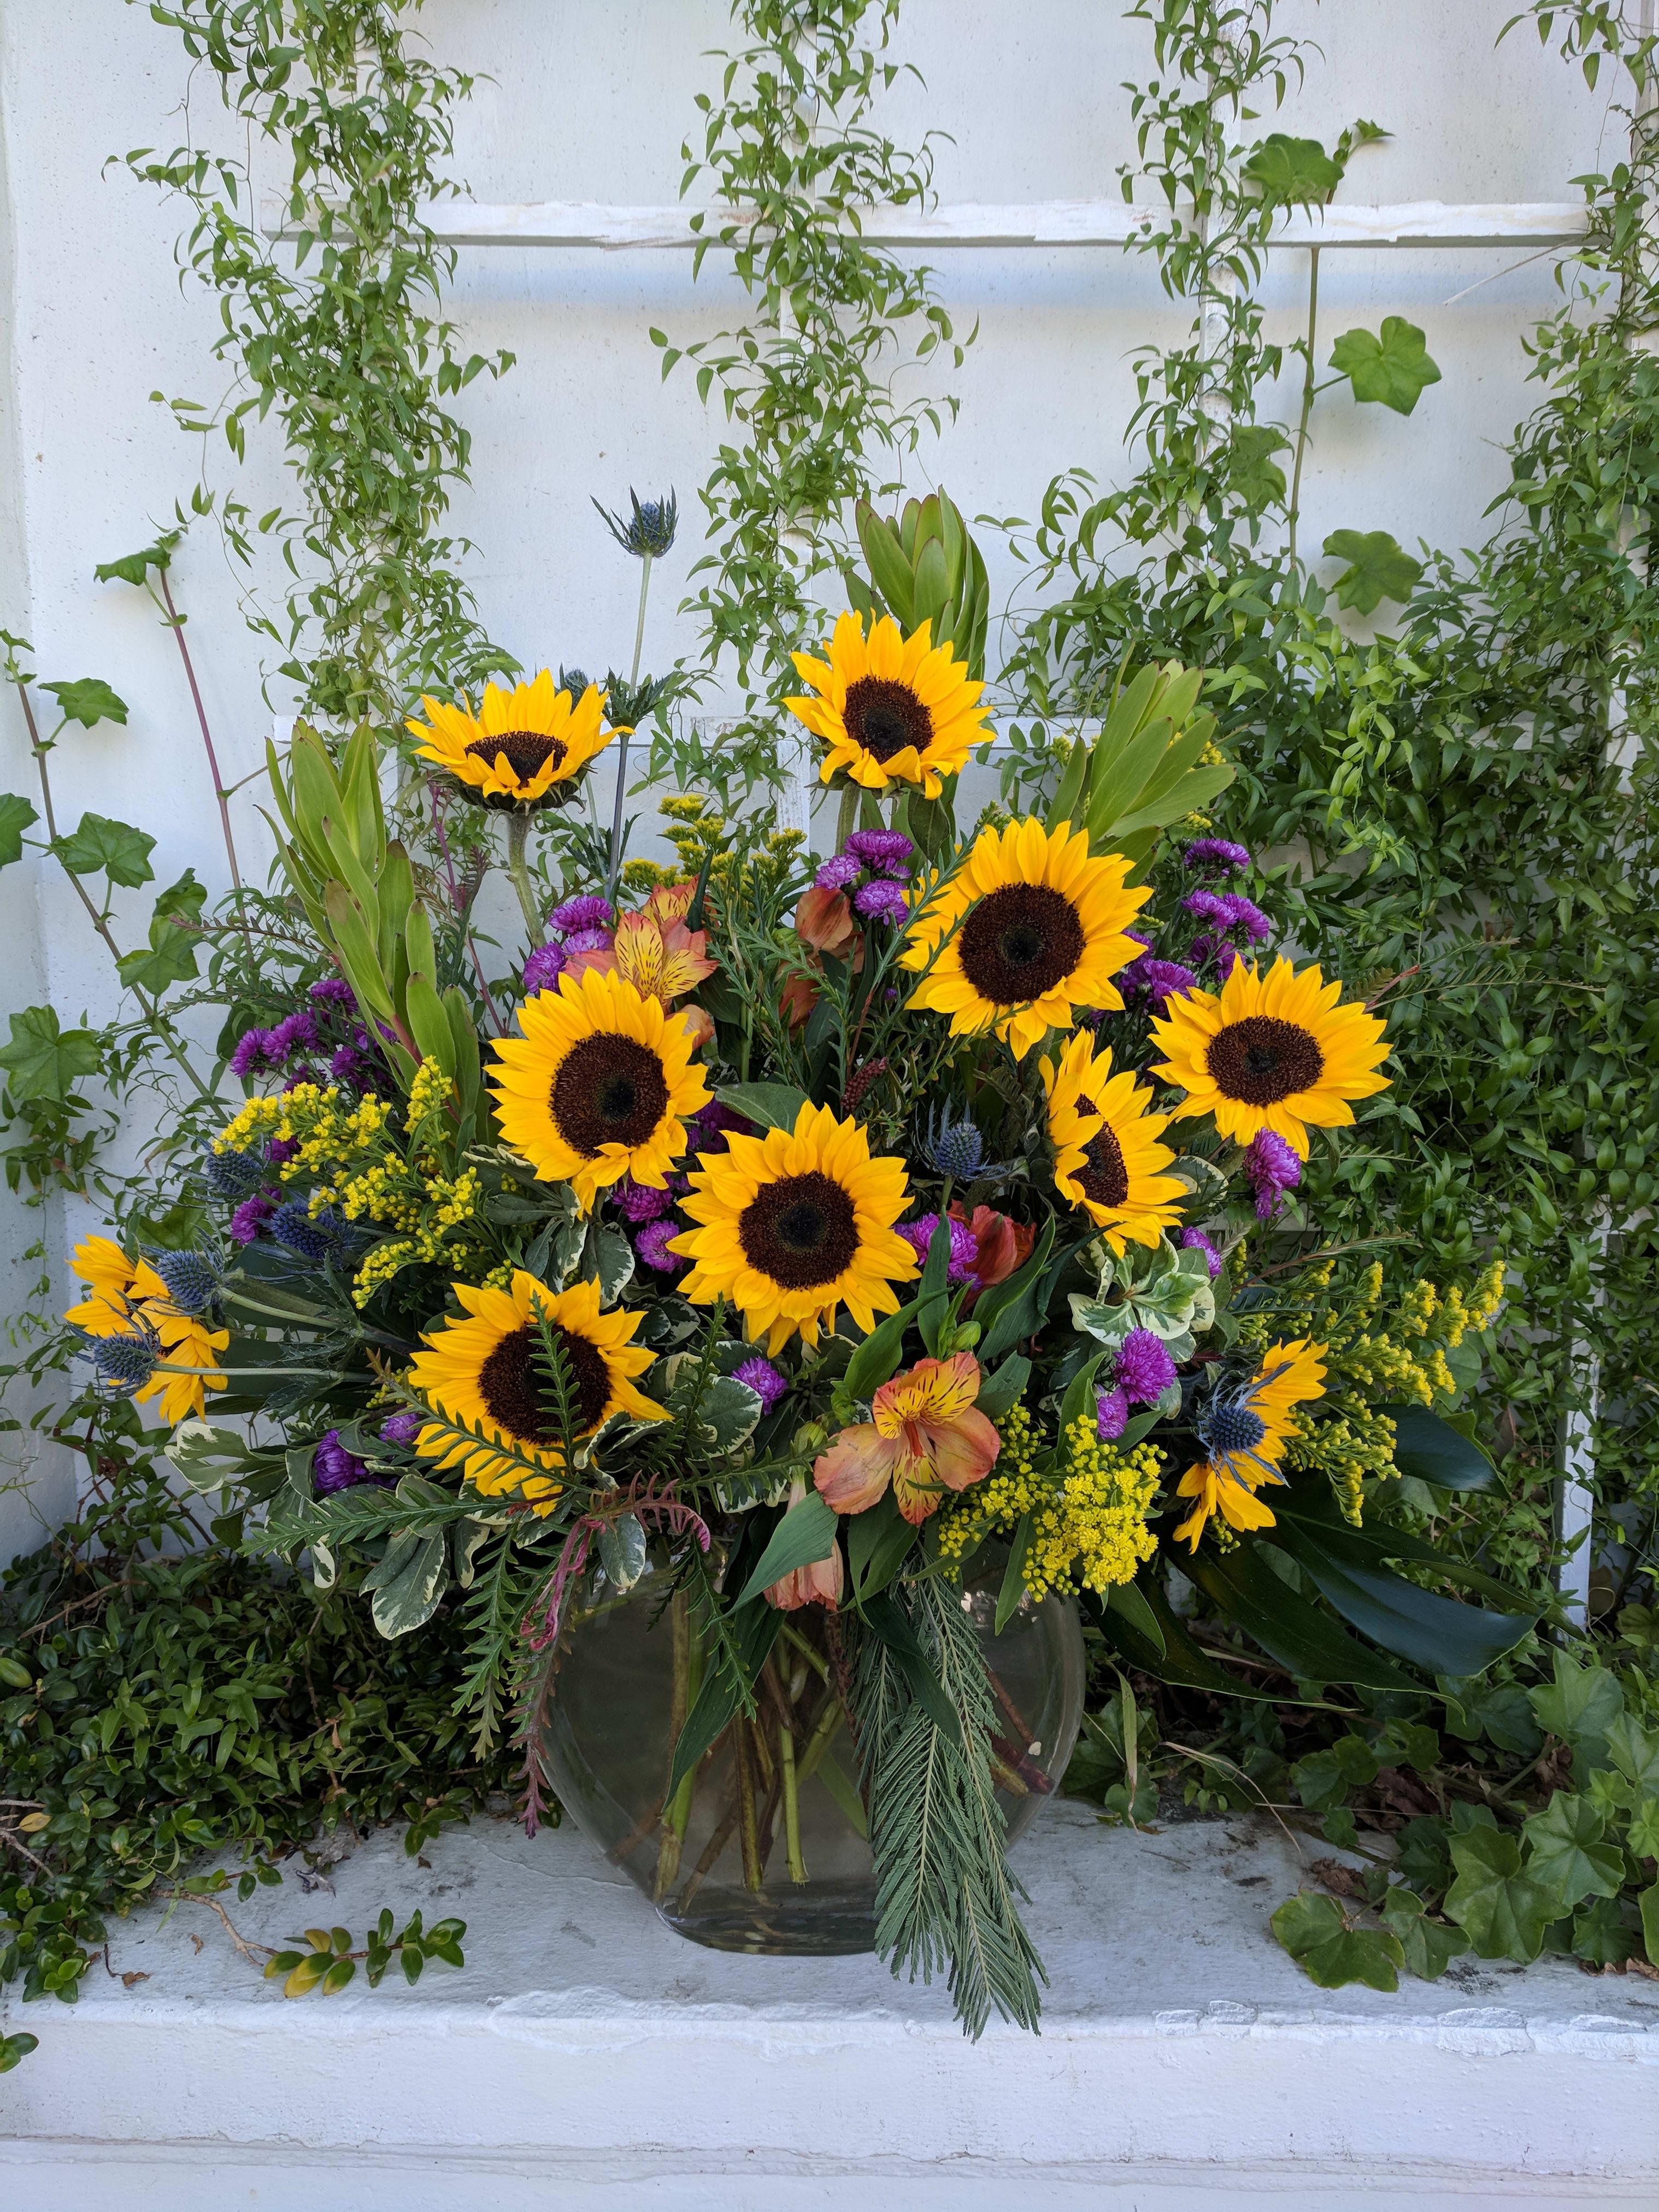 Sunflower Fields in Redlands, CA | Above the Stem